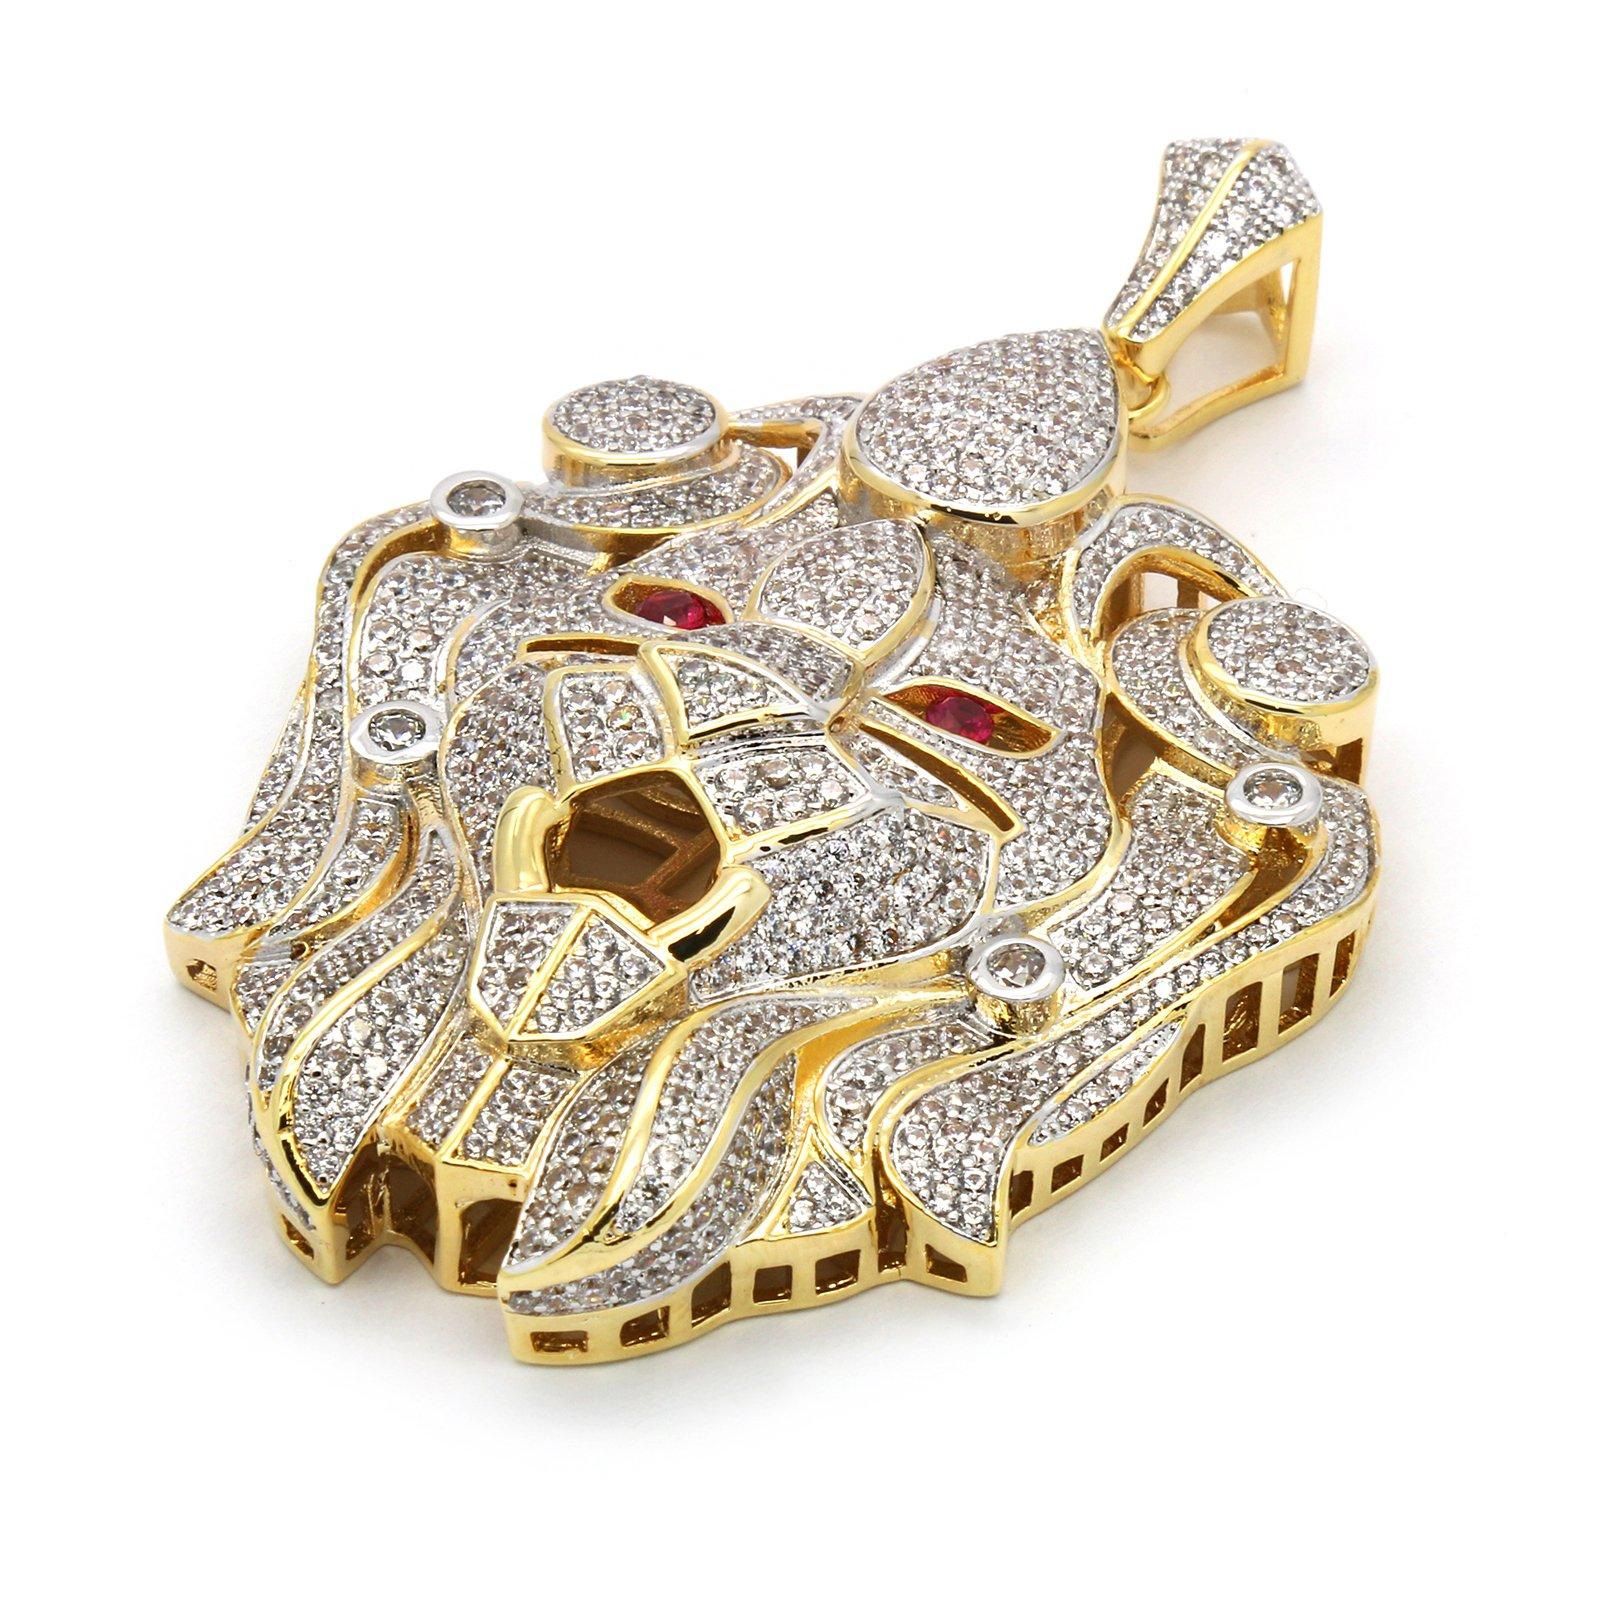 Men's Luxury Hip Hop Gold Plated Lion Face Piece Pendant 30'' 3mm Rope Chain Necklace Set SG01 by L & L Nation